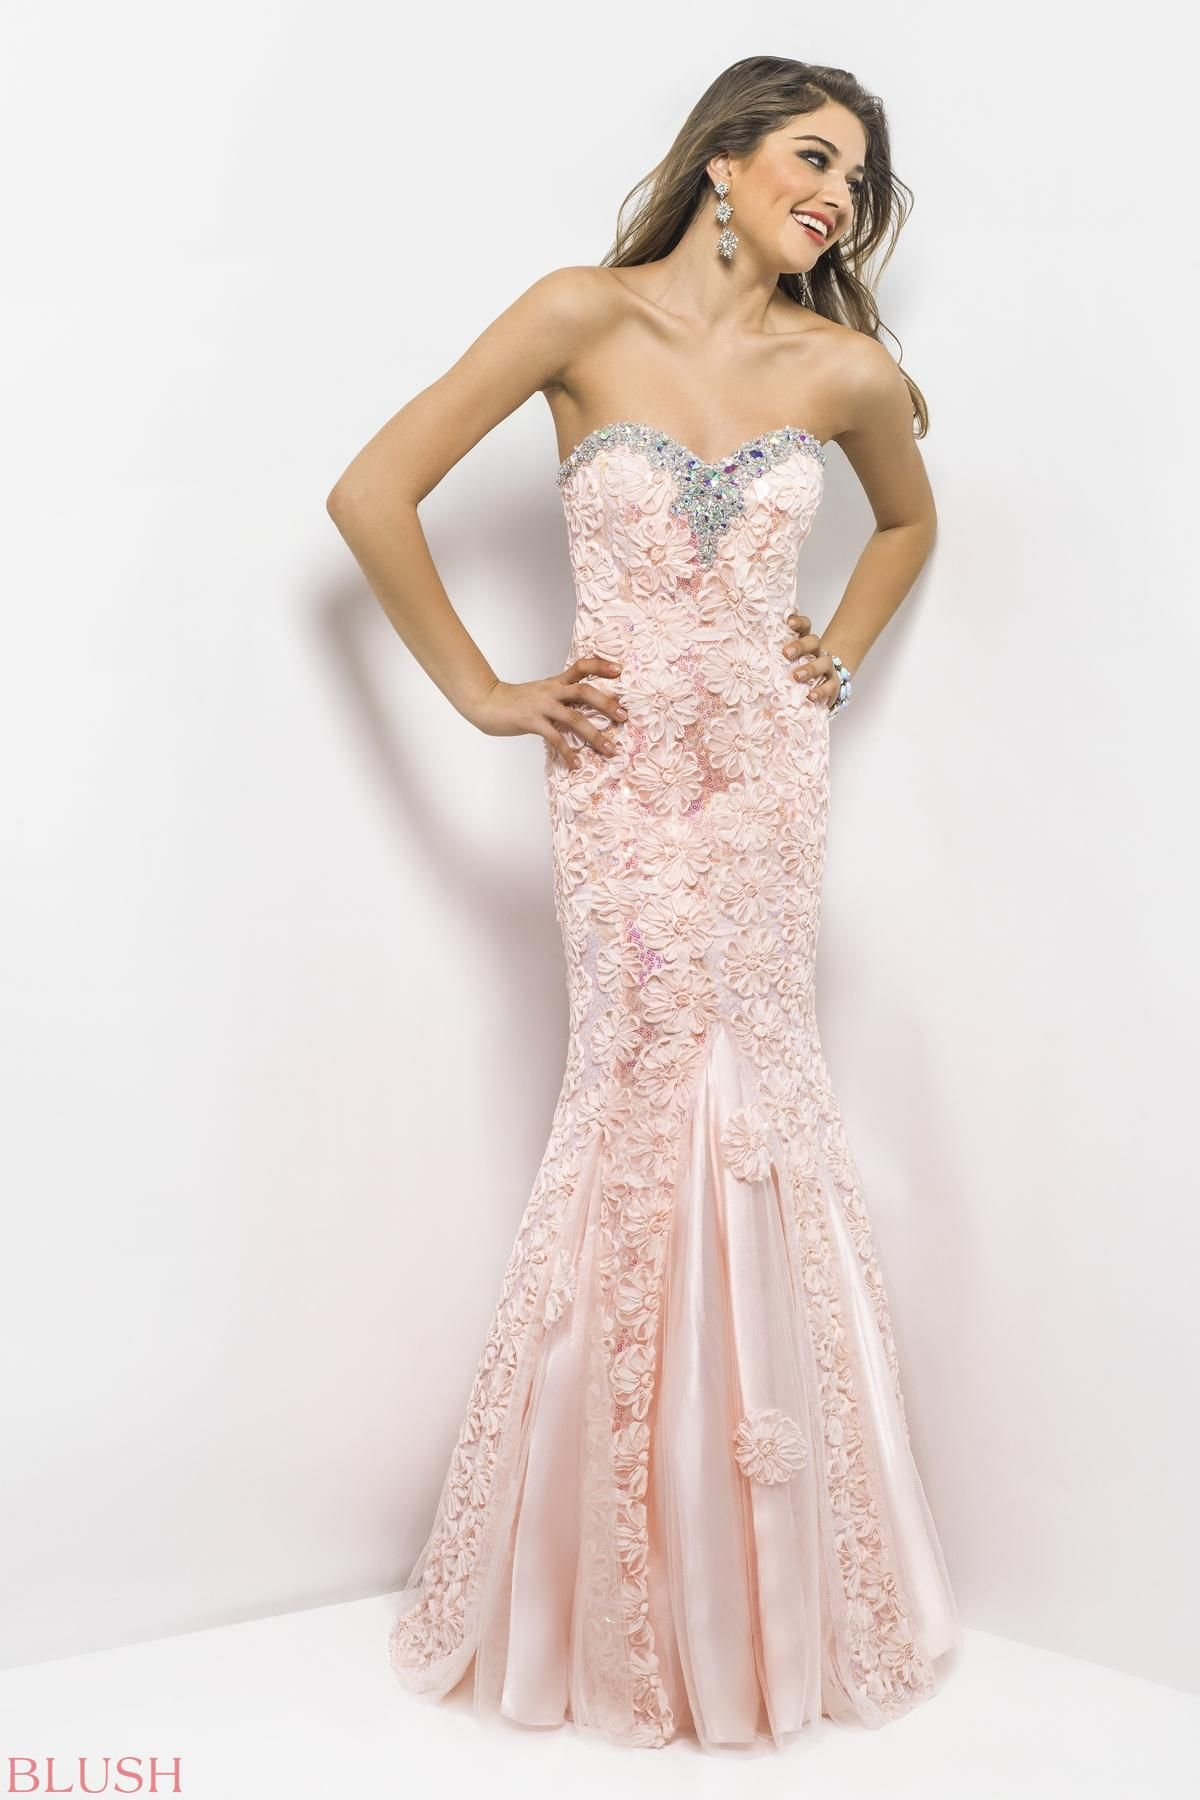 Elegant peach prom dress silver jewels define your bust as